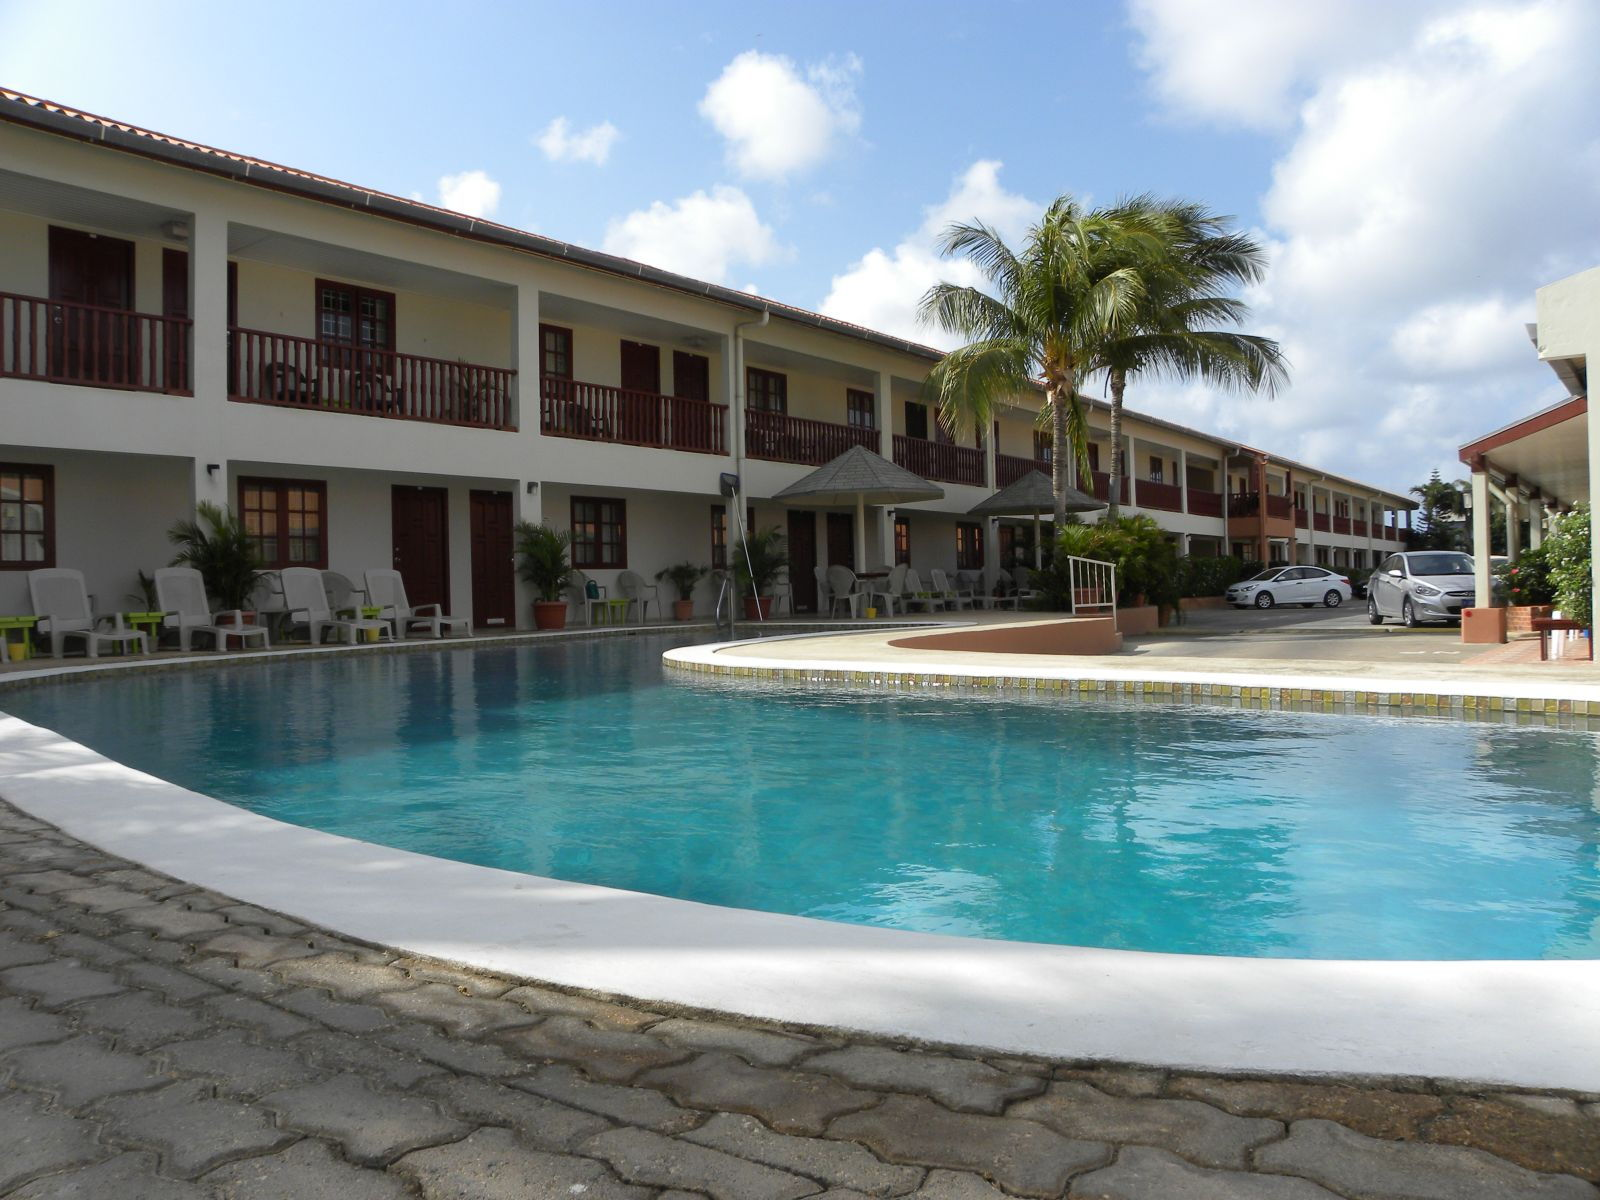 Dscn2609 Aruba Quality Apartments